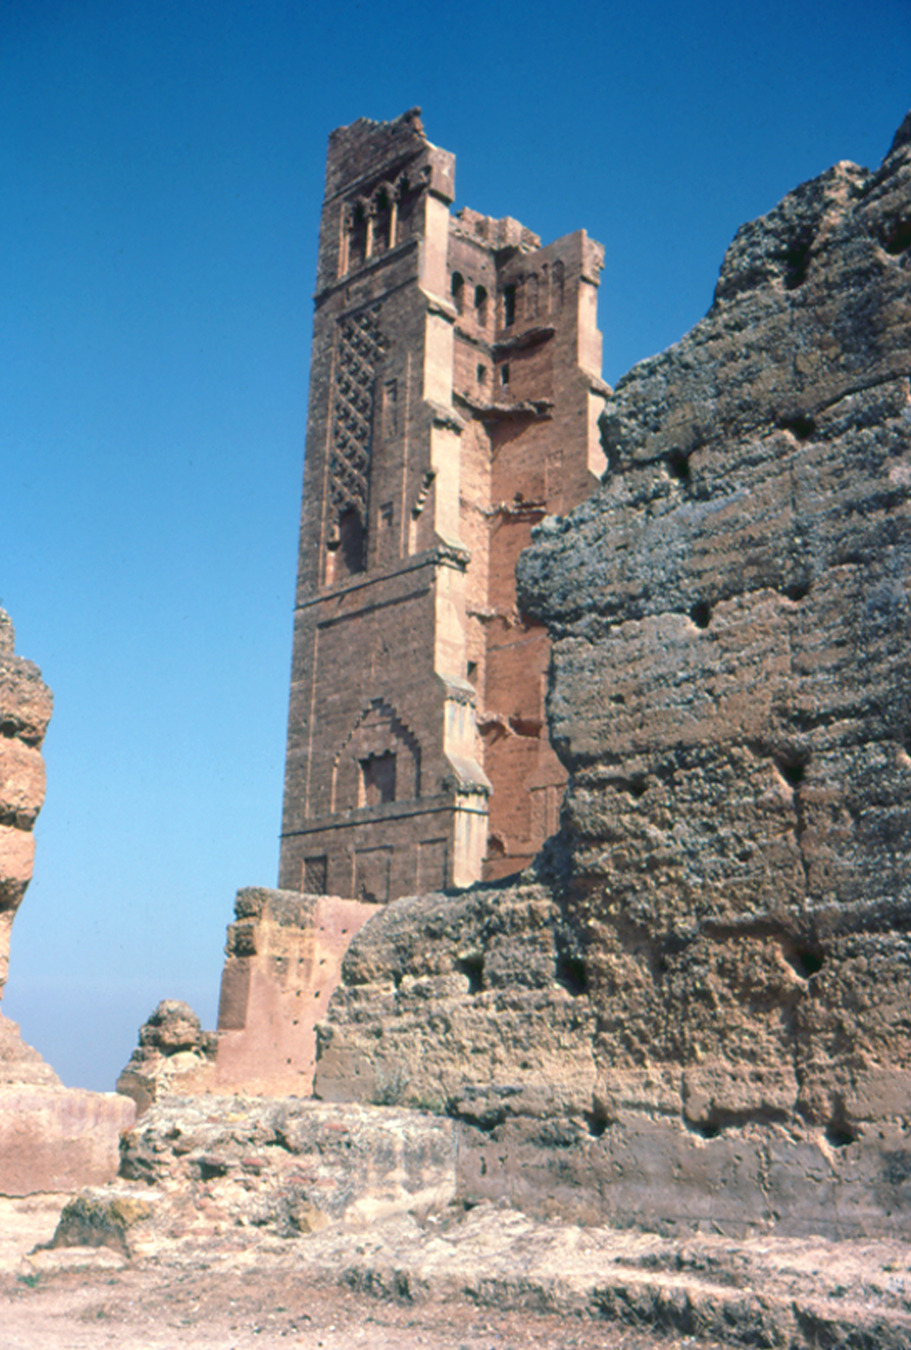 Tlemcen Algeria  city photos gallery : Tlemcen, Algeria Ruin of Mansoura Wikimedia Commons